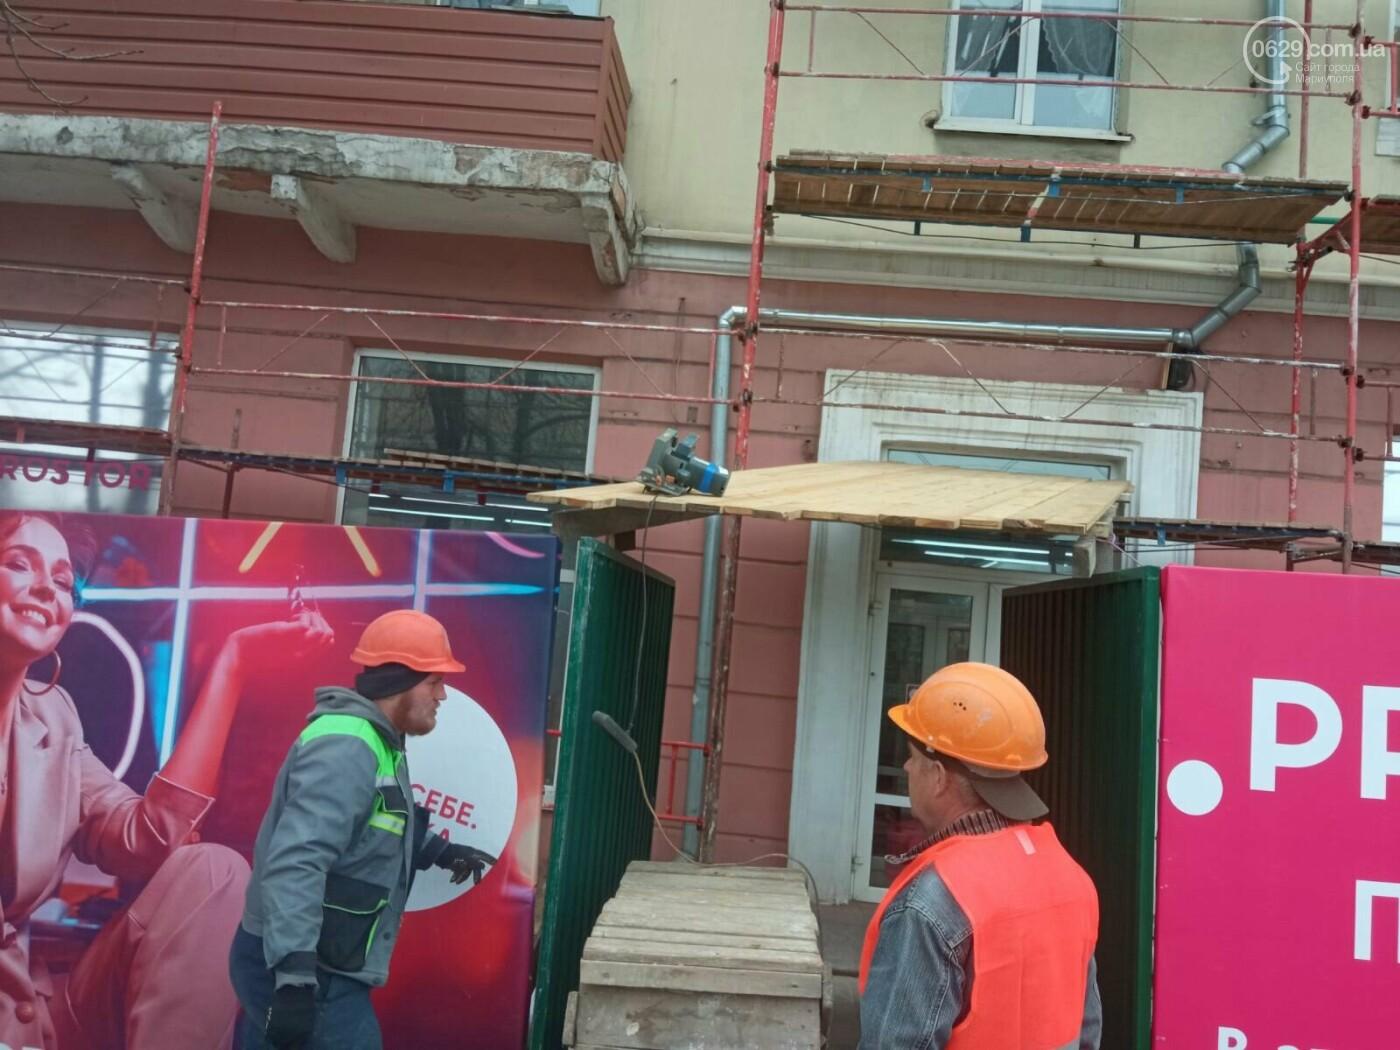 В Мариуполе отремонтируют здание с часами, - ФОТО, фото-3